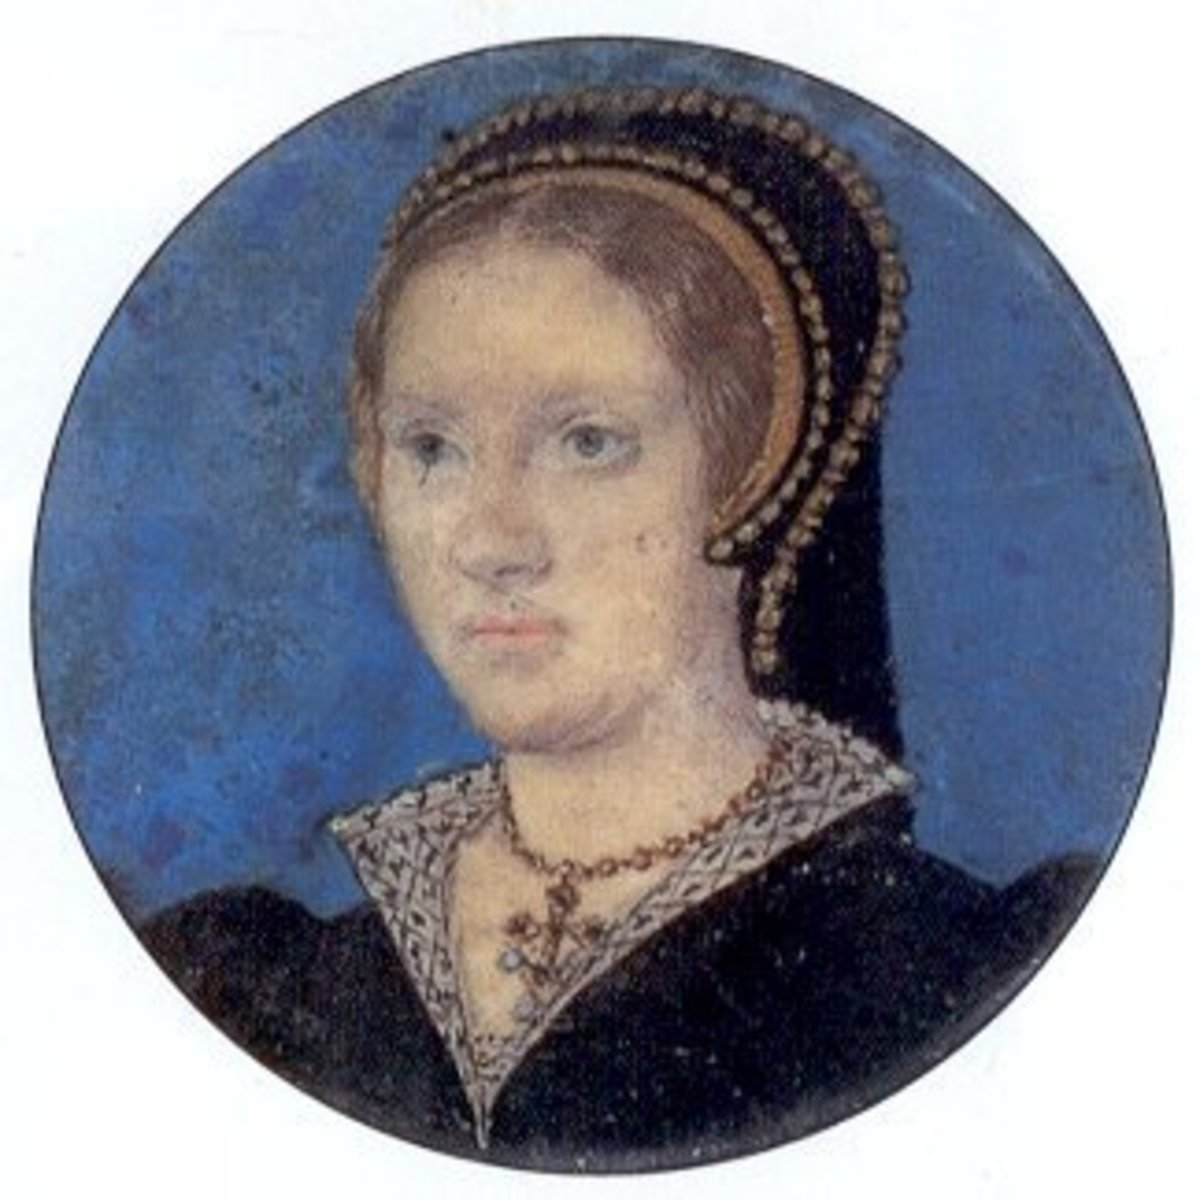 Catherine Parr miniature, c 1543